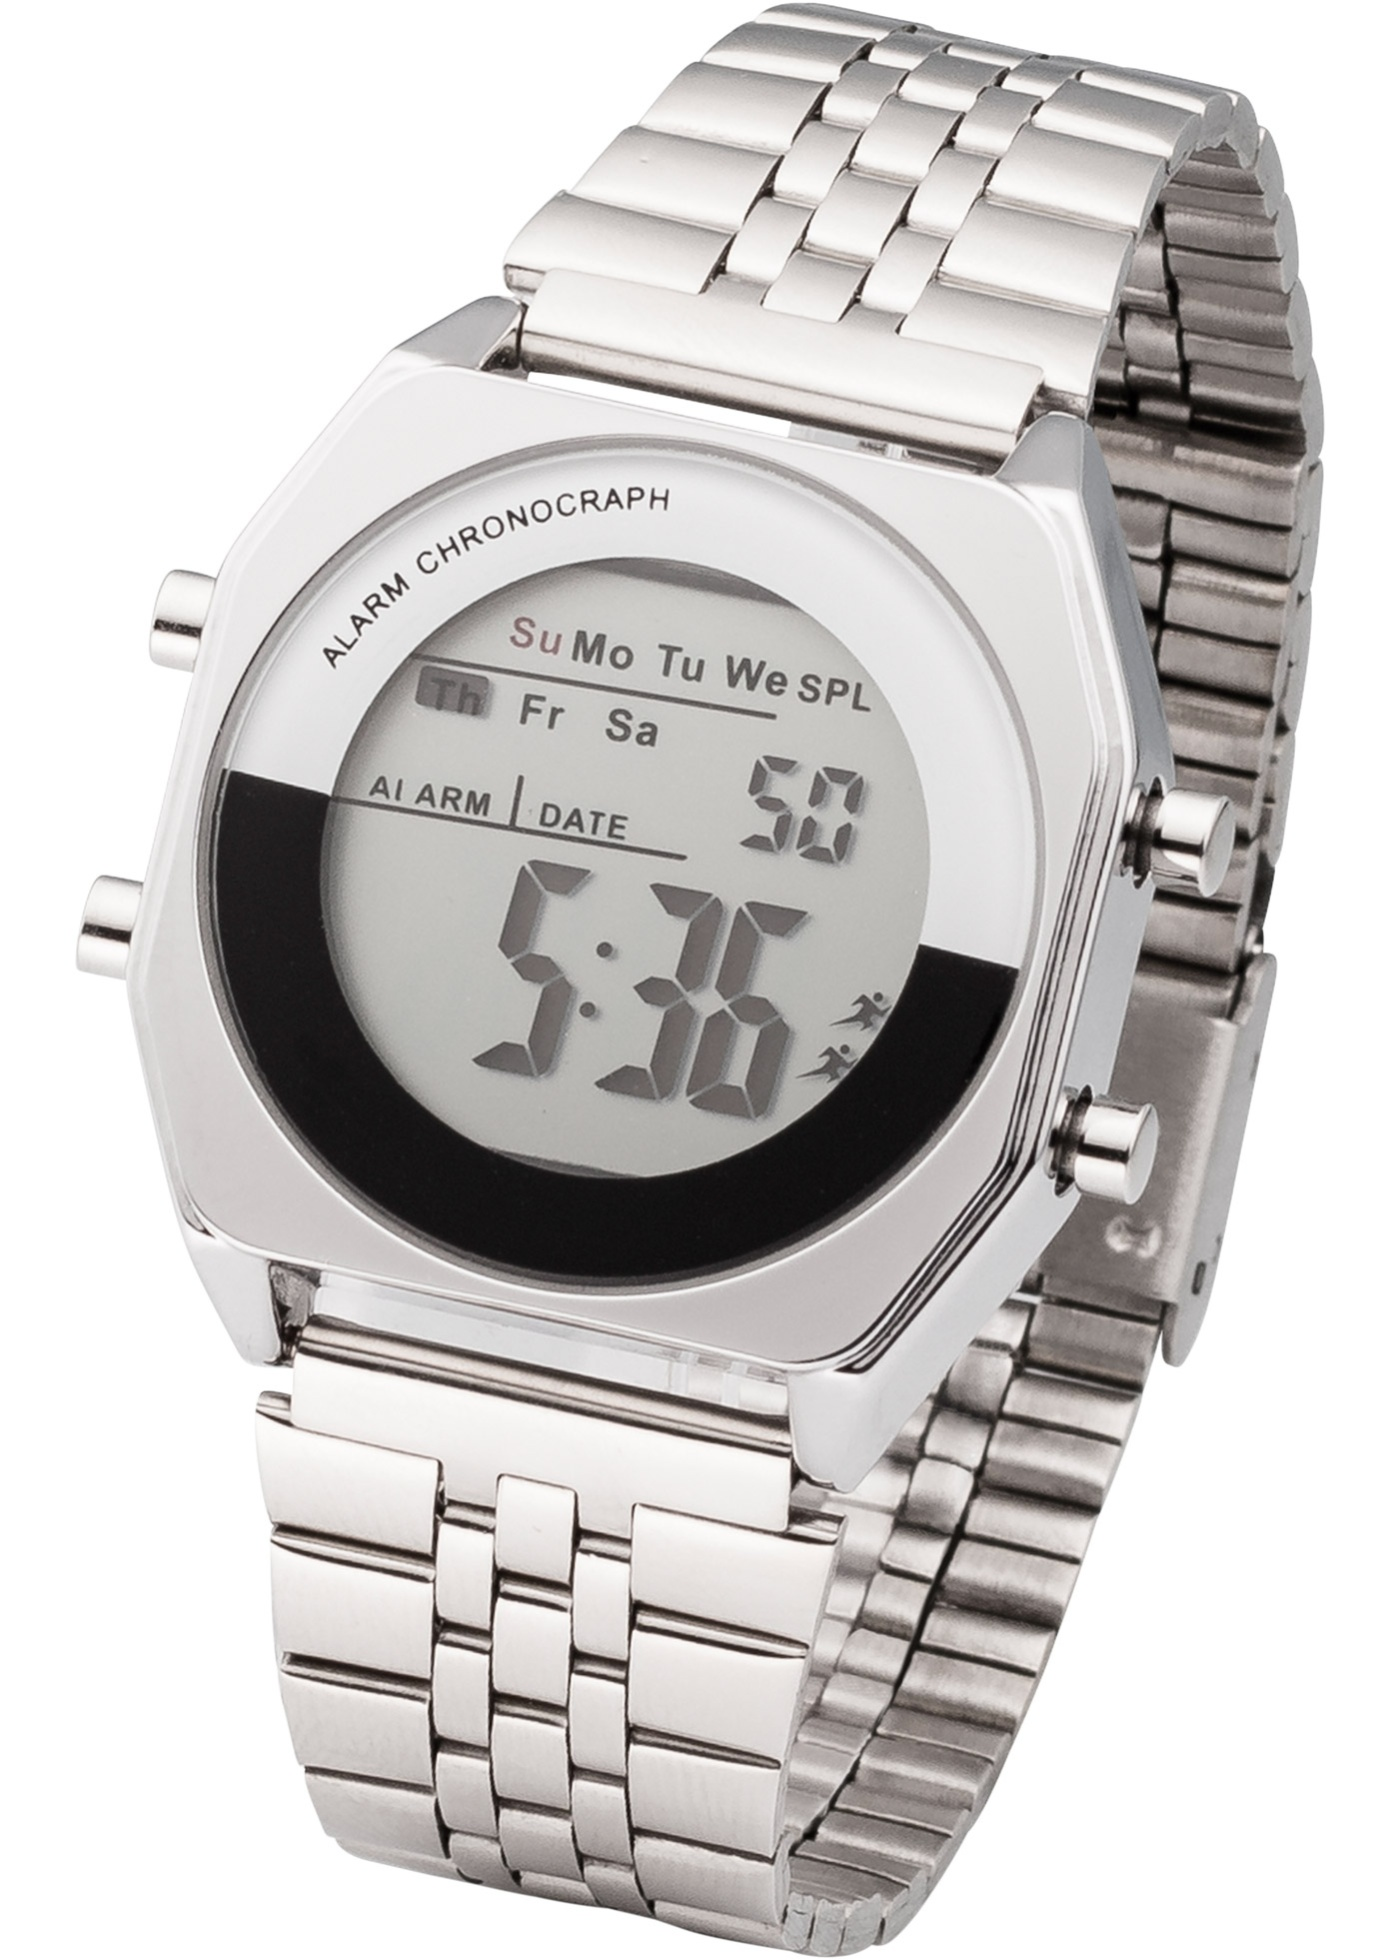 Montre bracelet digitale